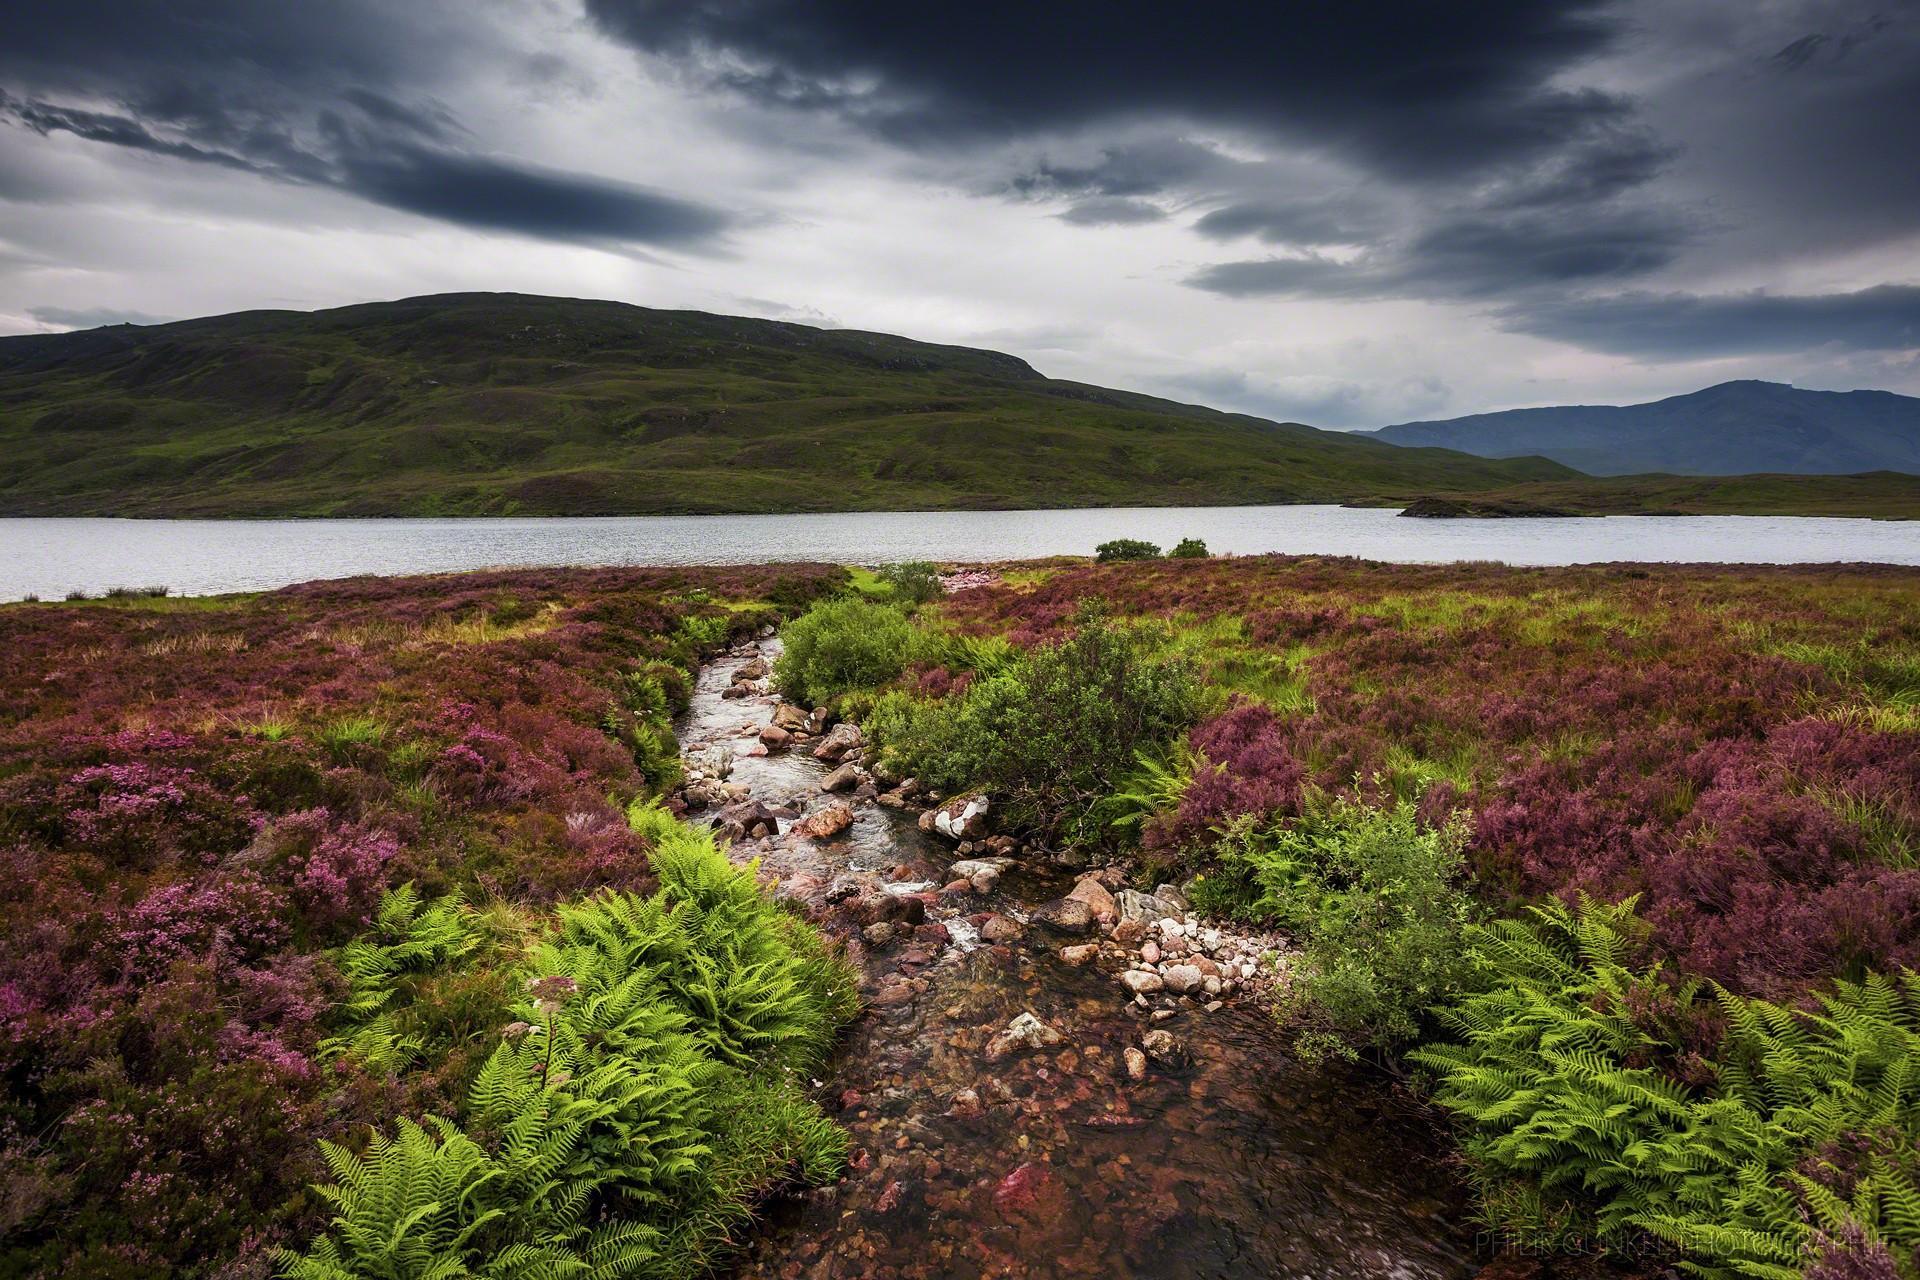 scotland_philip_gunkel_photographie_www.philipgunkel.de22